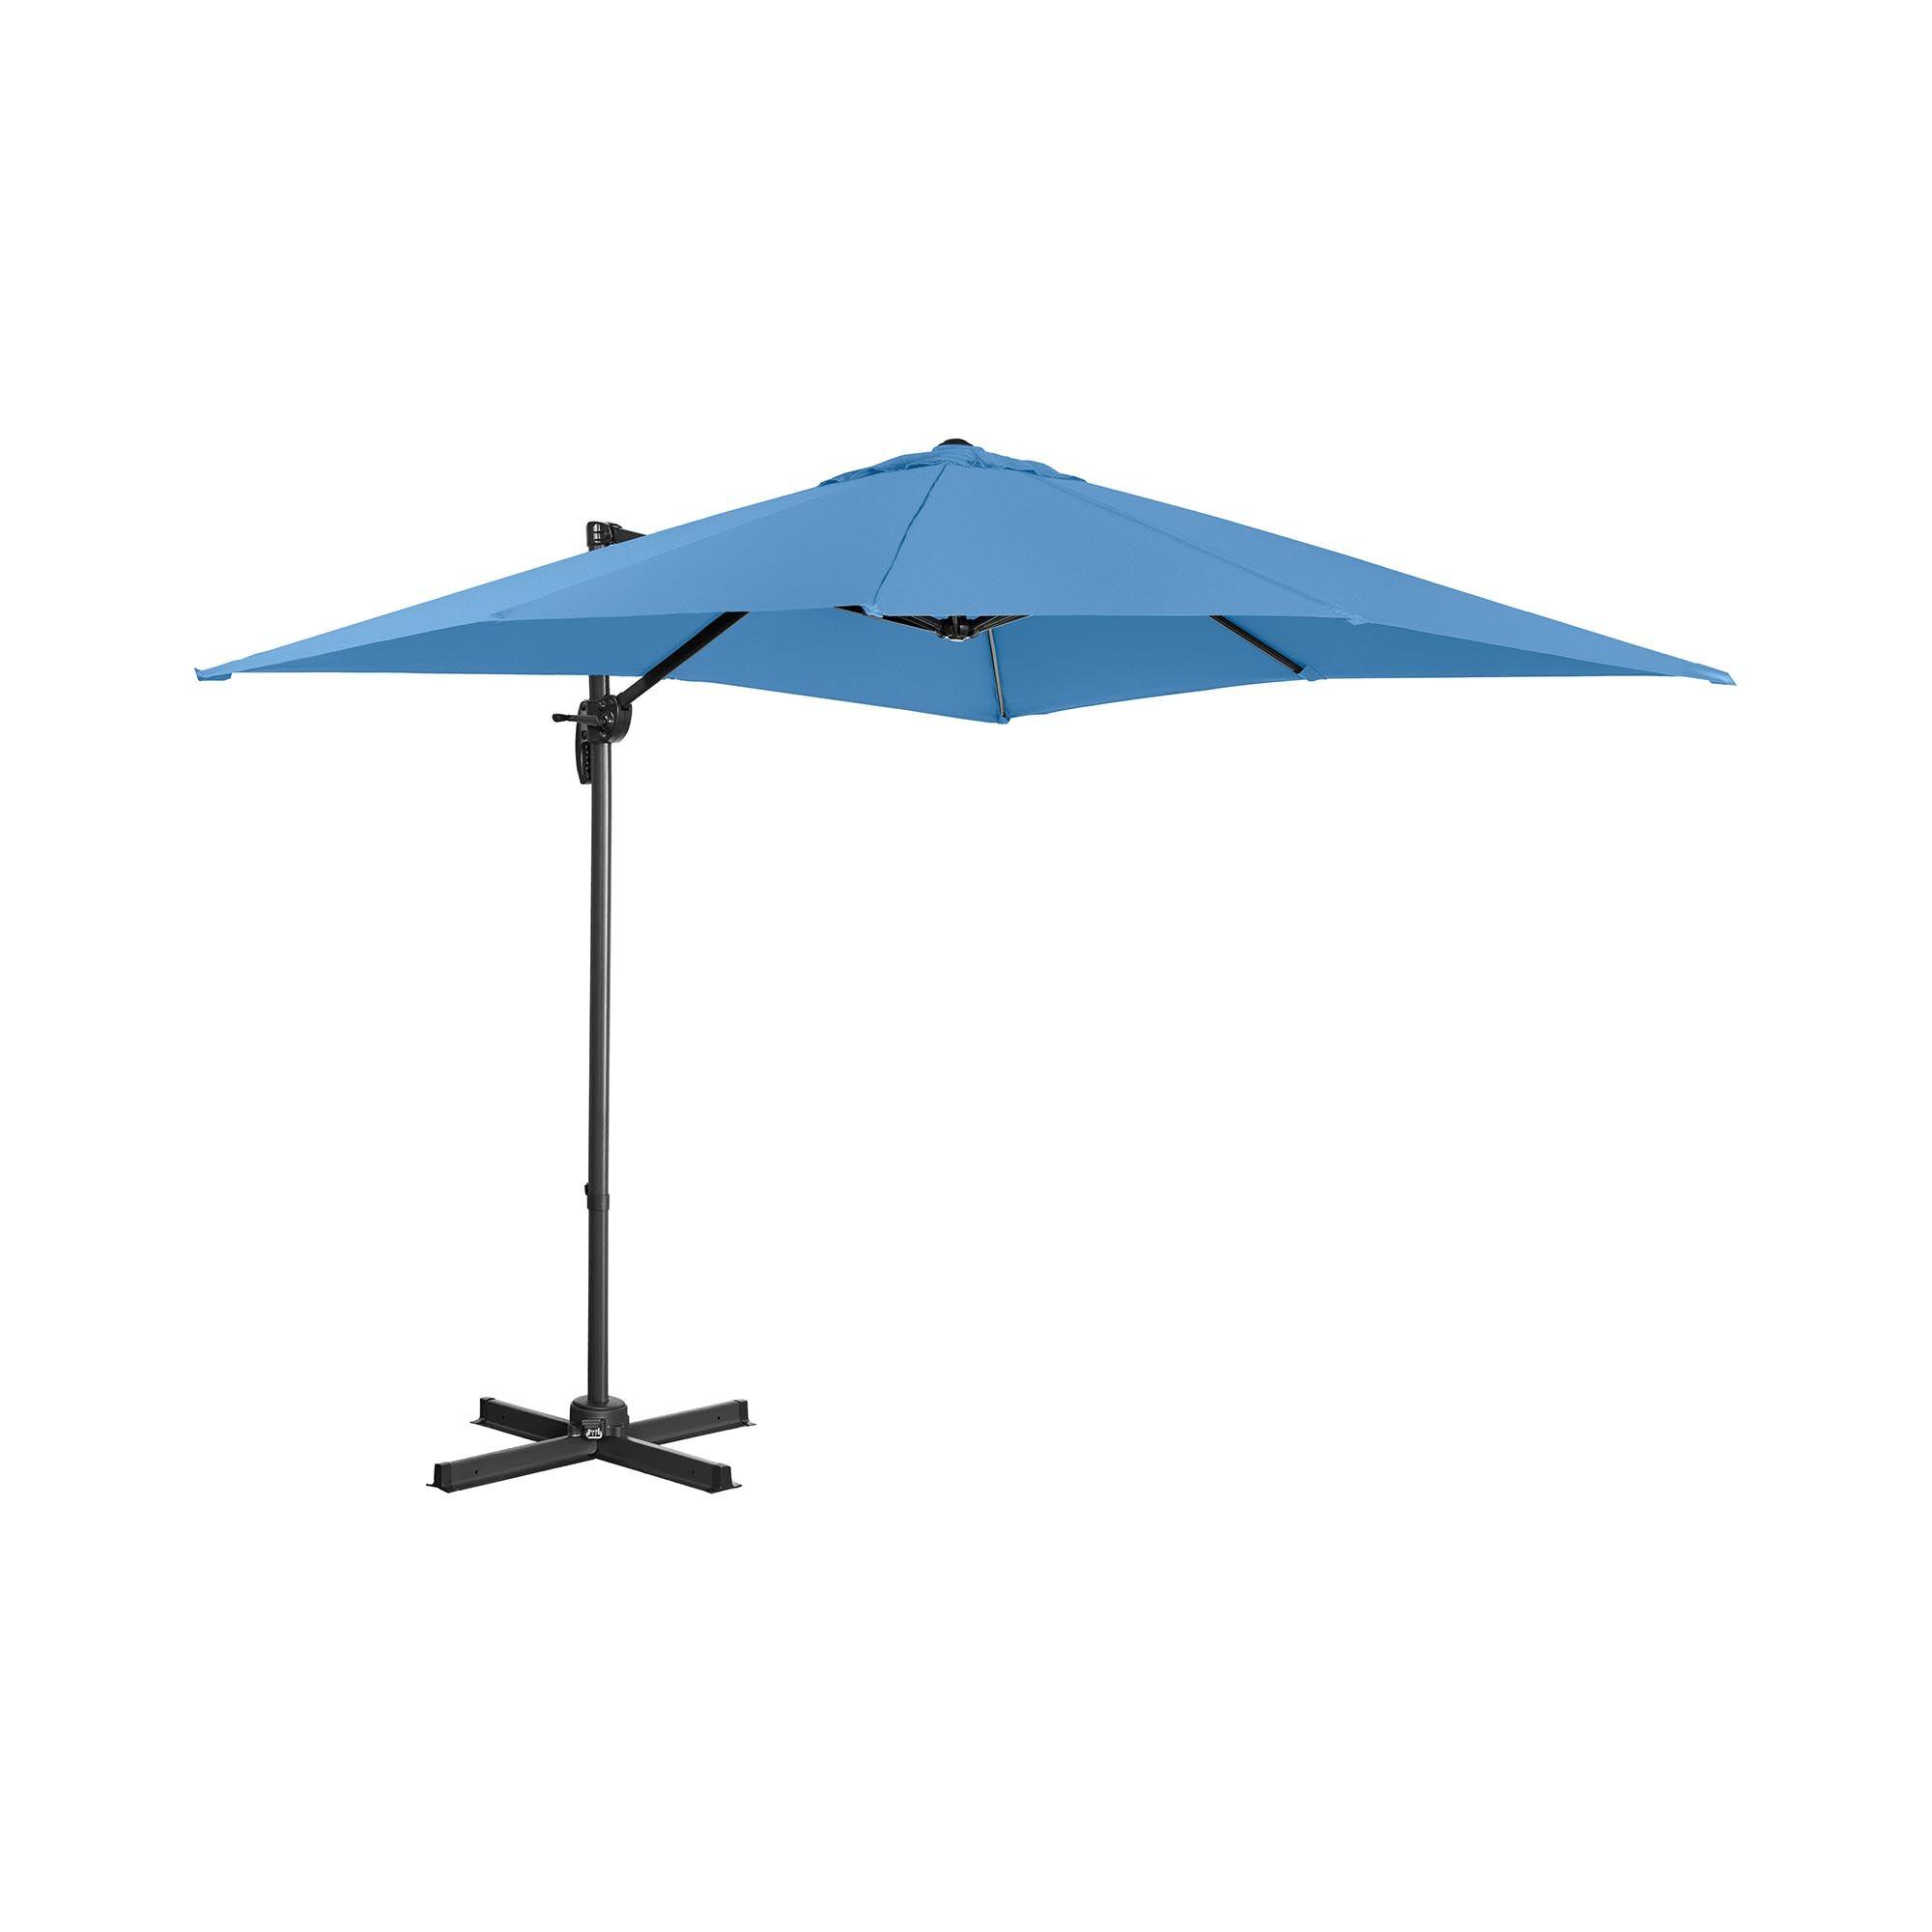 Uniprodo Hængeparasol - blå - firkantet - 250 cm i diameter - drejelig UNI_UMBRELLA_2SQ250BL